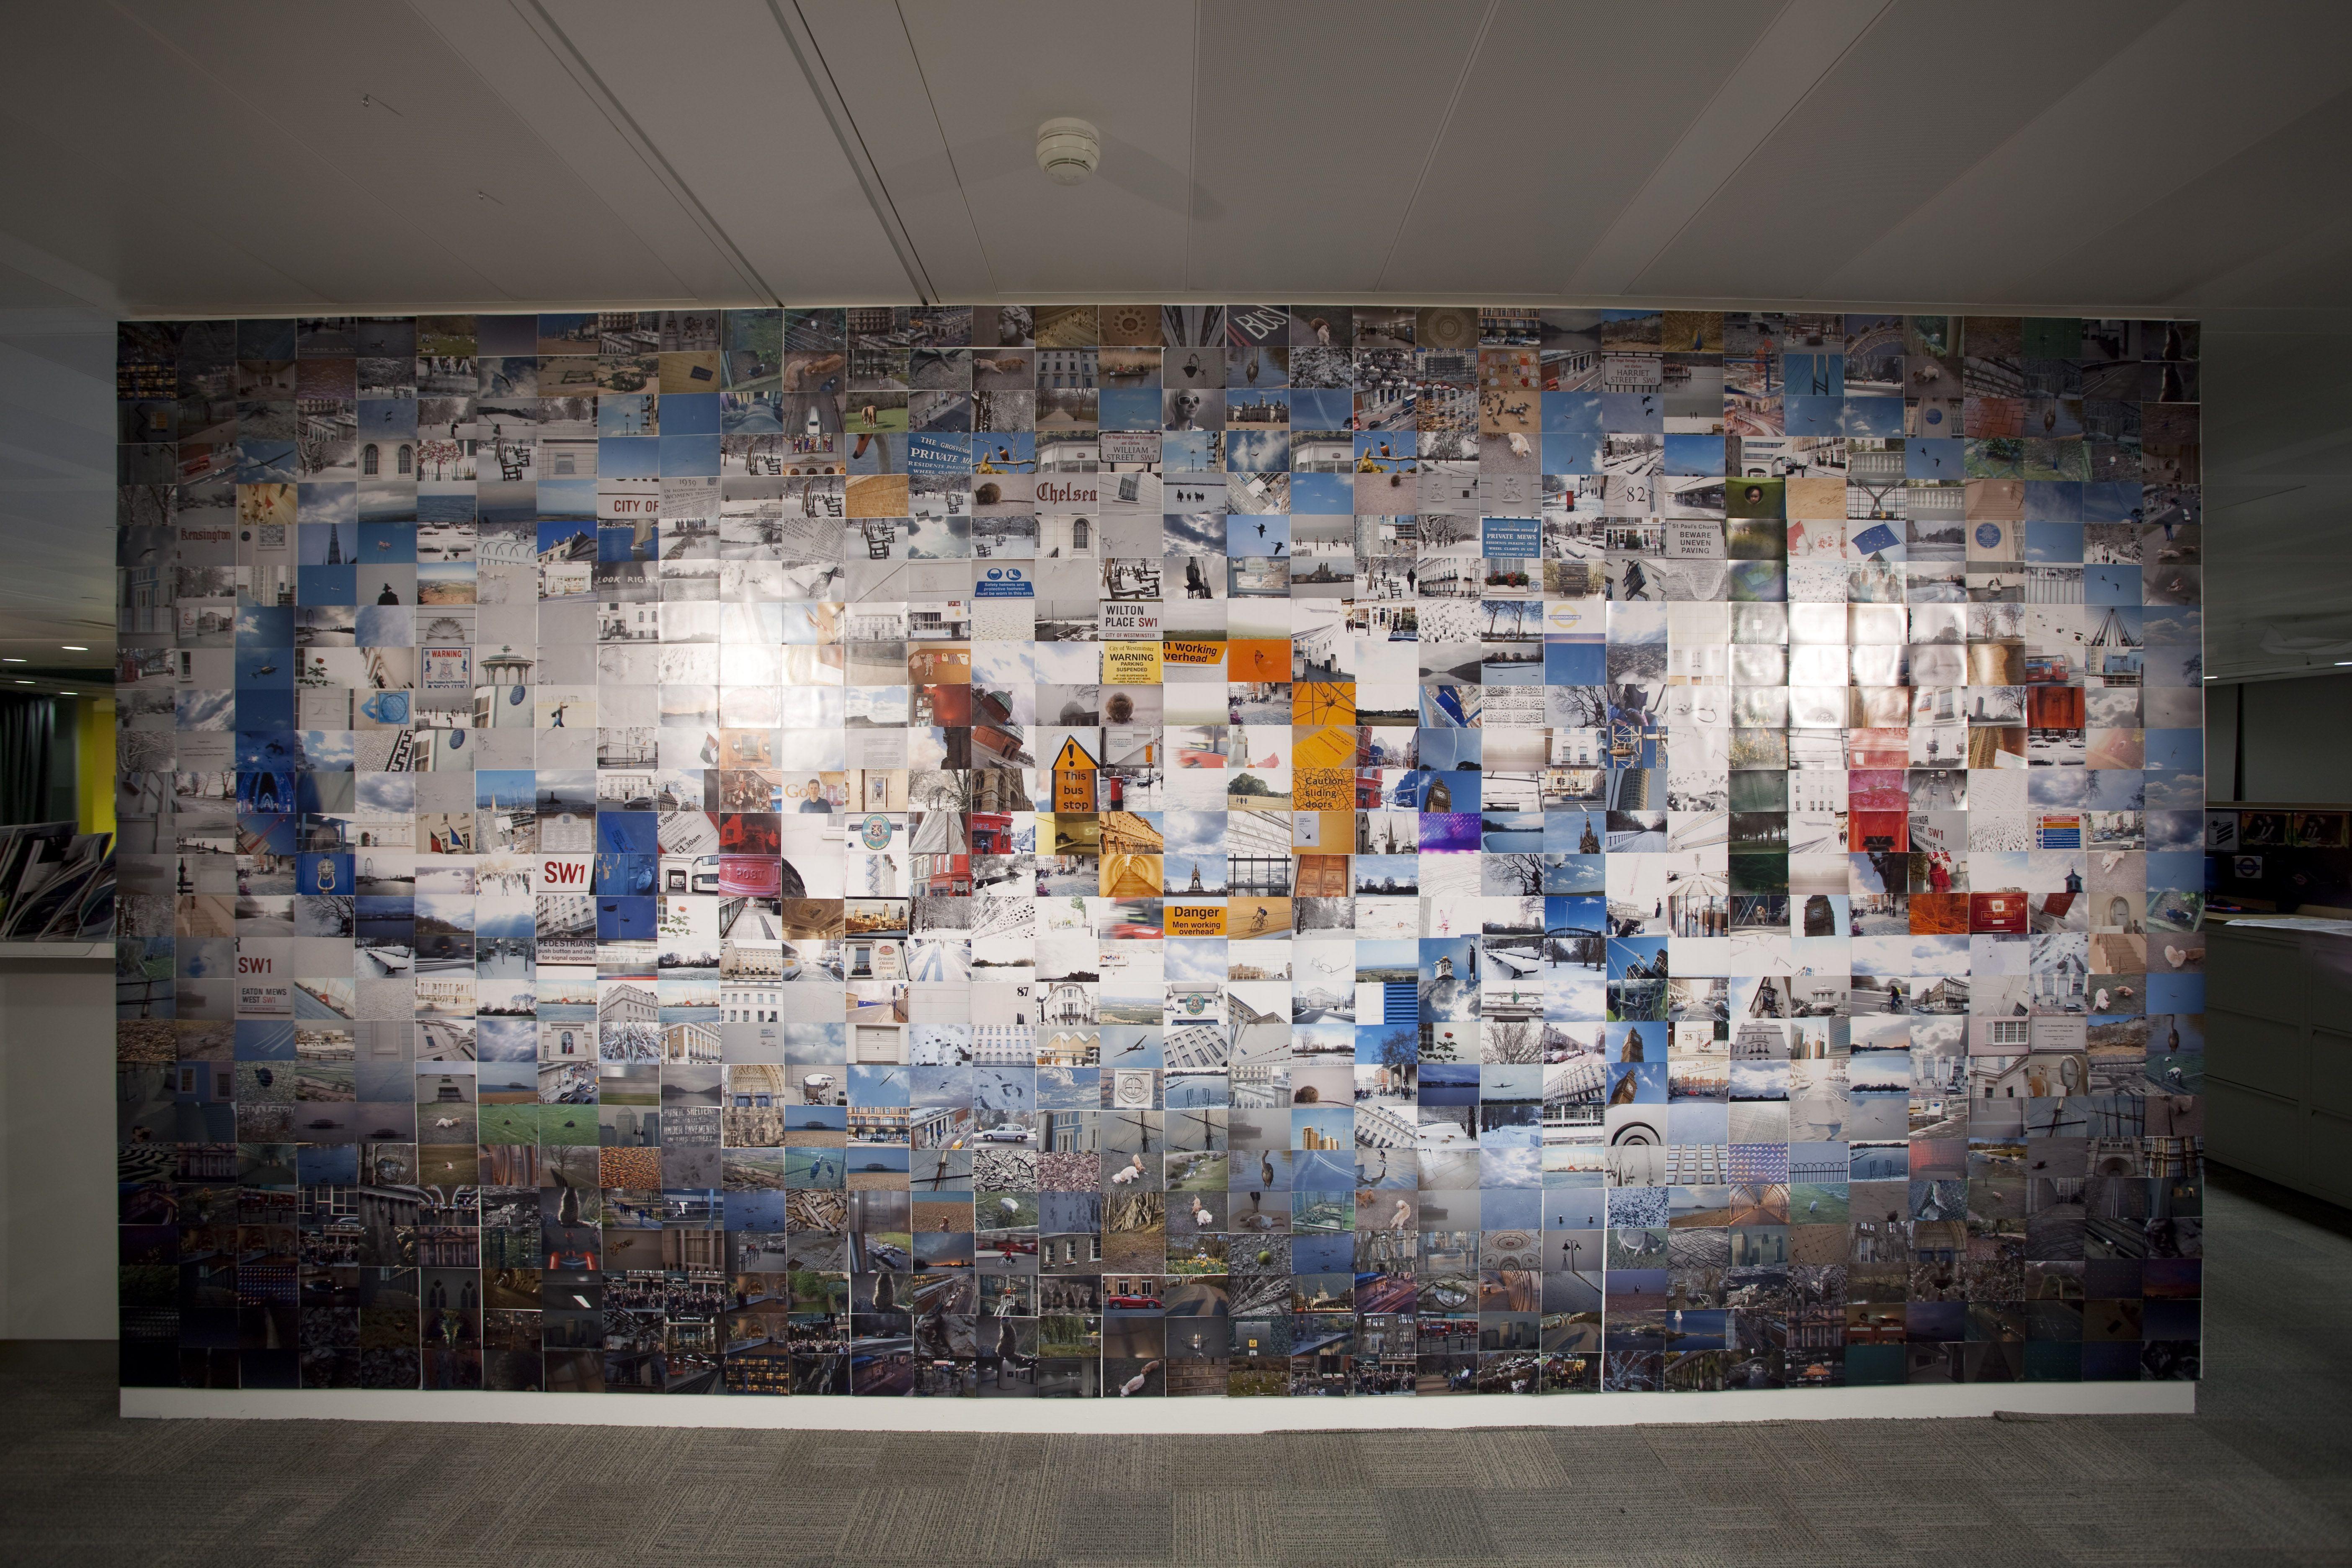 Winners From Google S Wall Art Contest Office Wall Art Wall Art